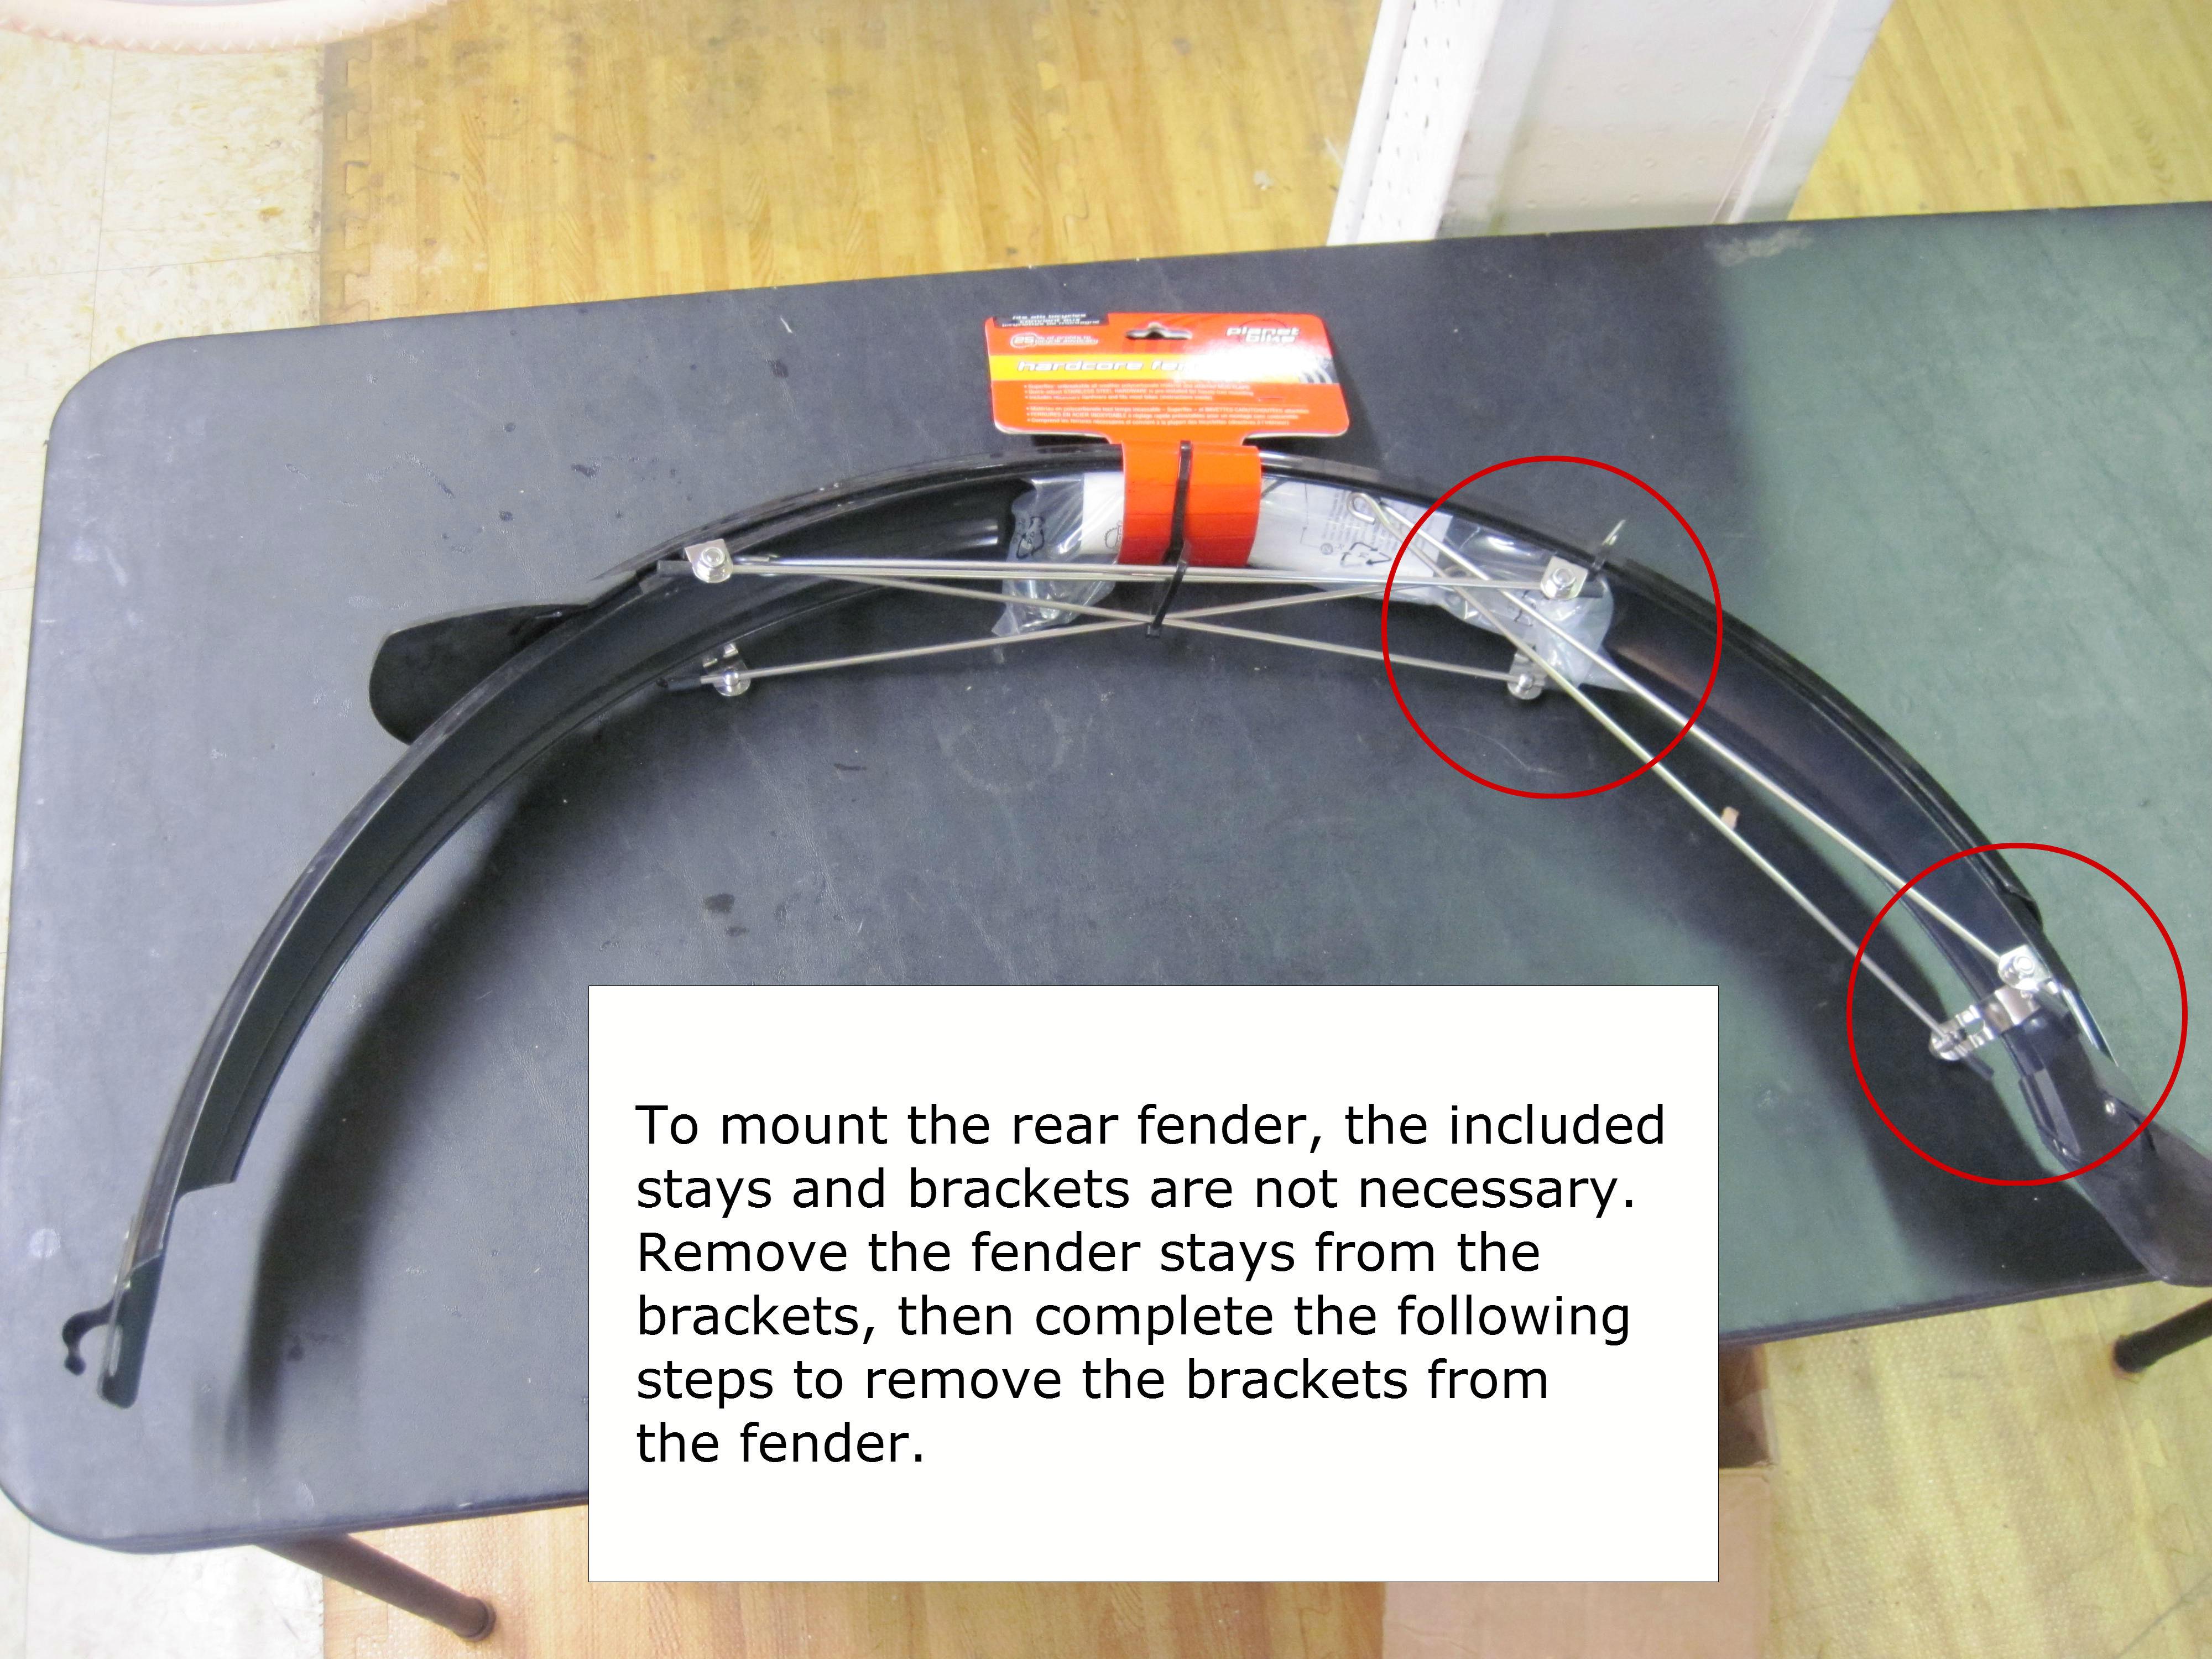 2) RearFender